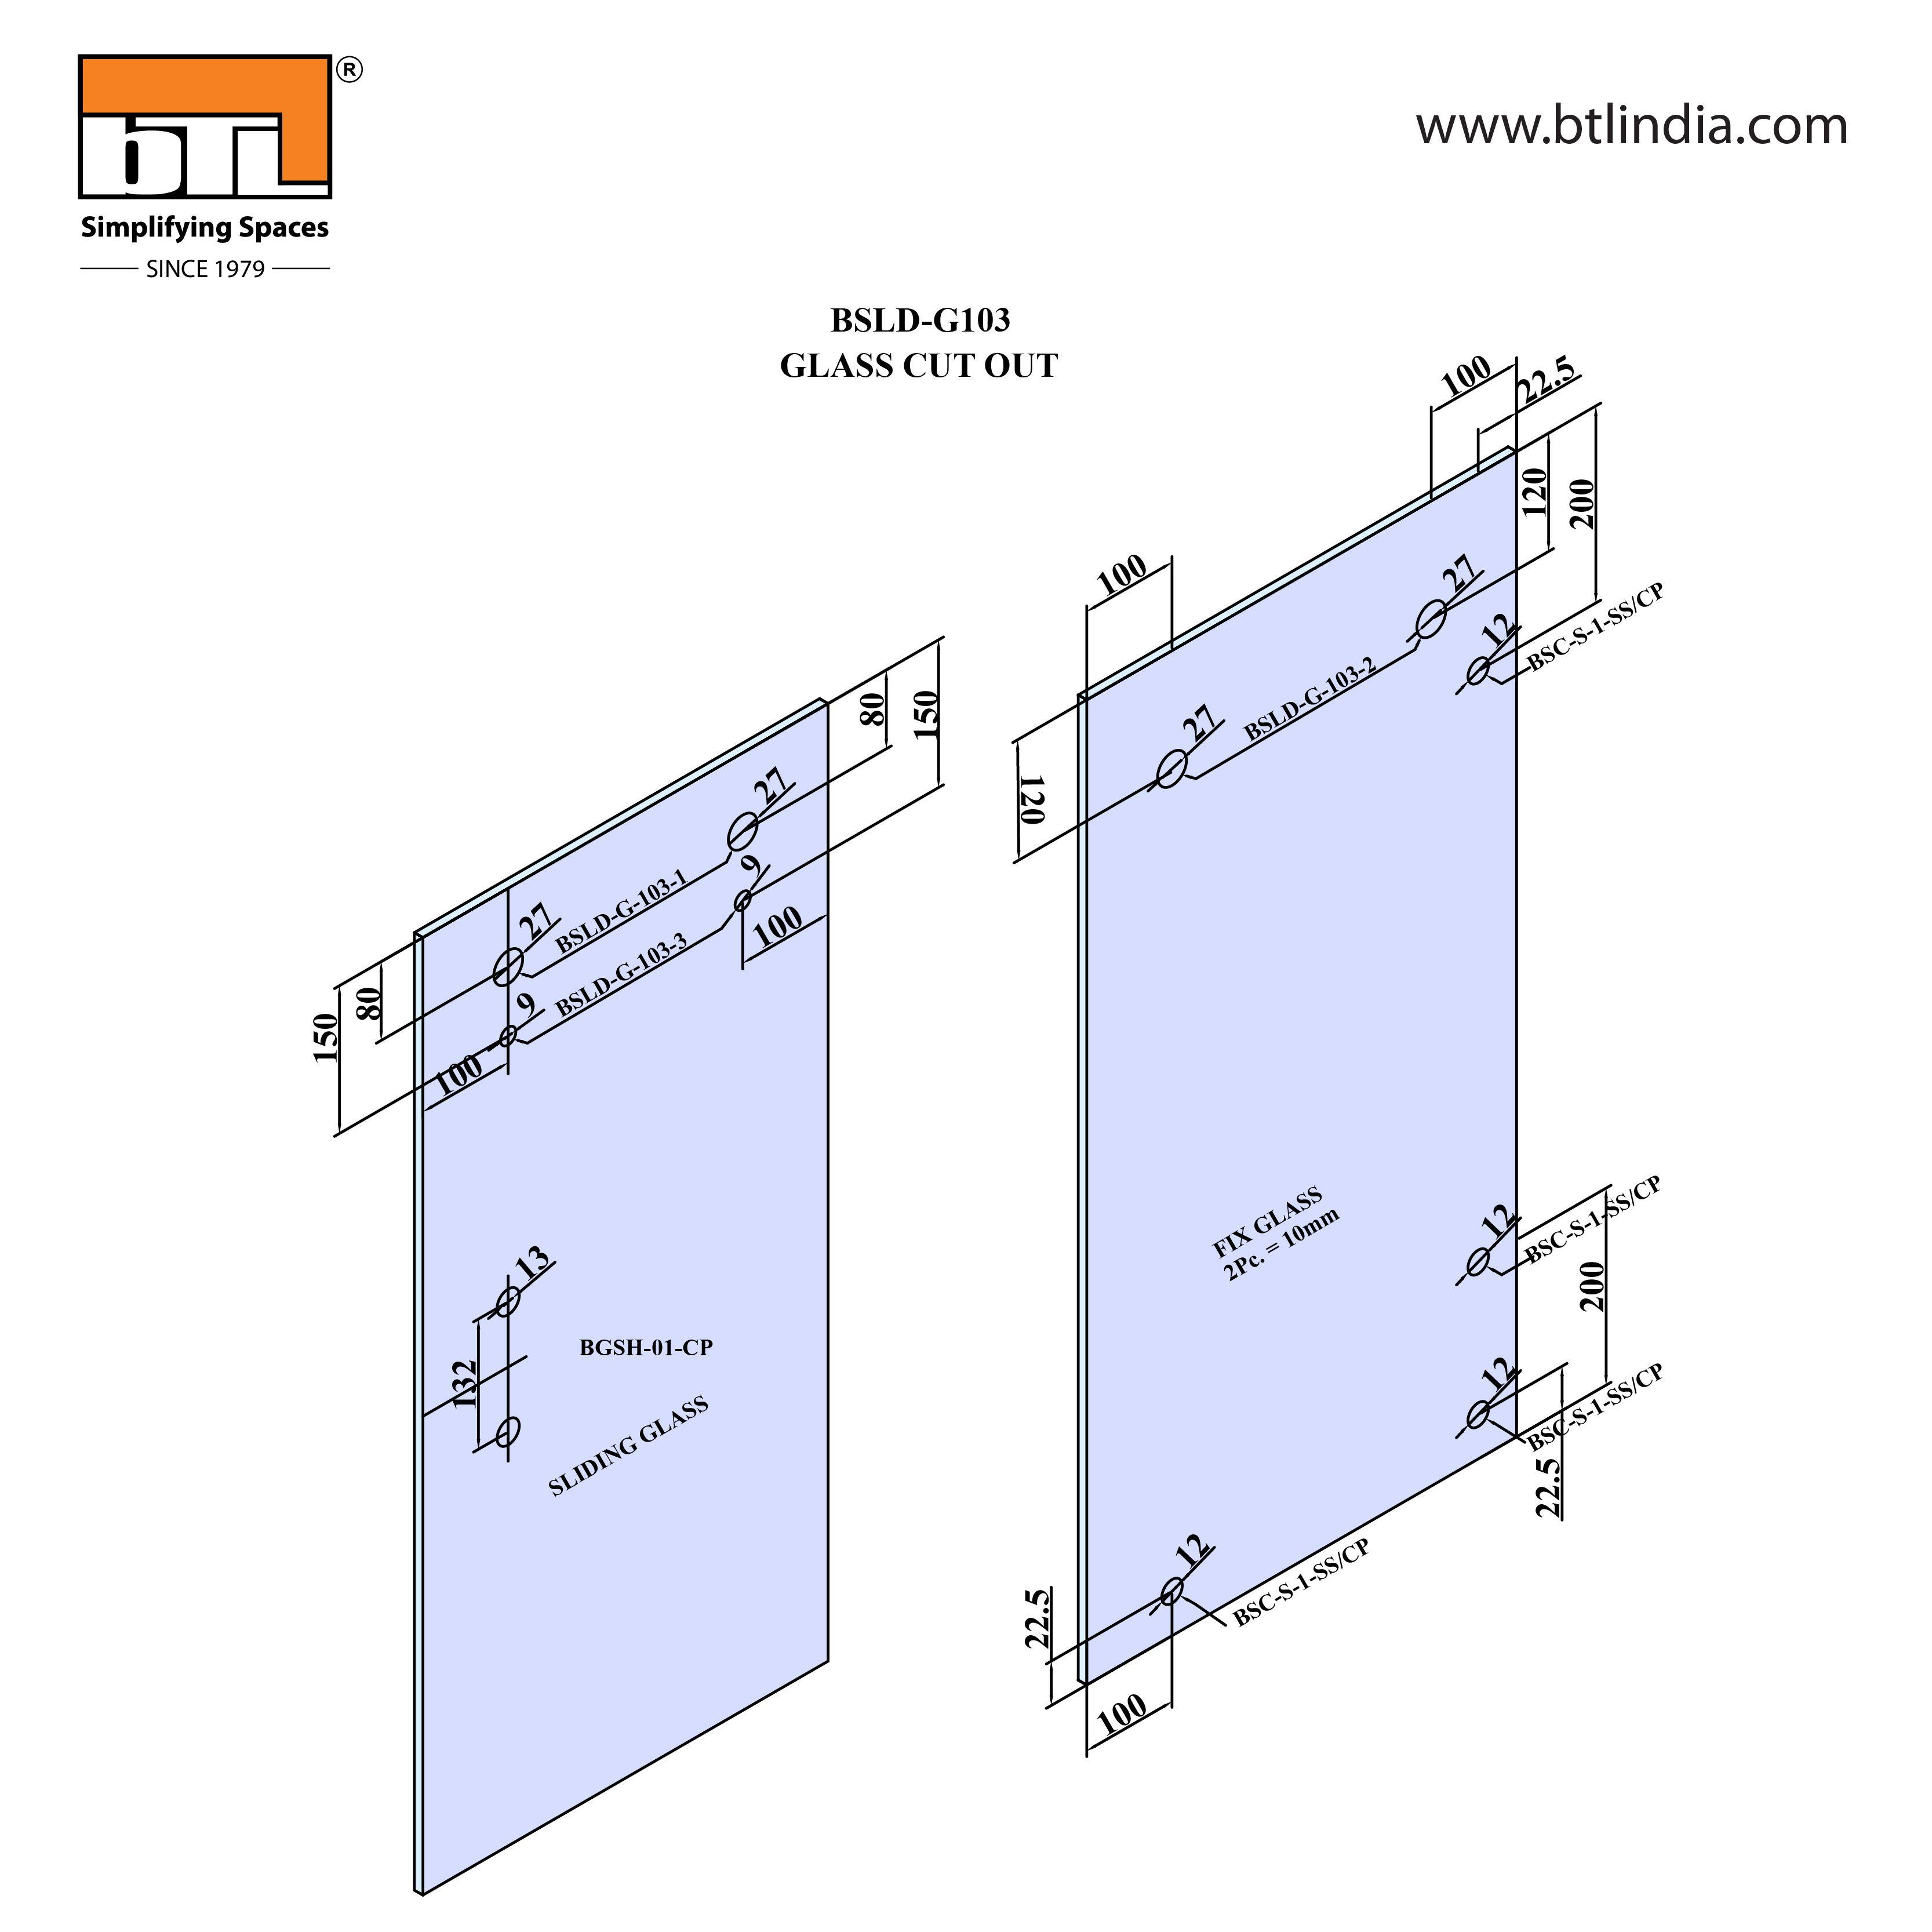 BTL Glass Door Sliding Set - G103 - Installation Instruction with Glass Door Cut out